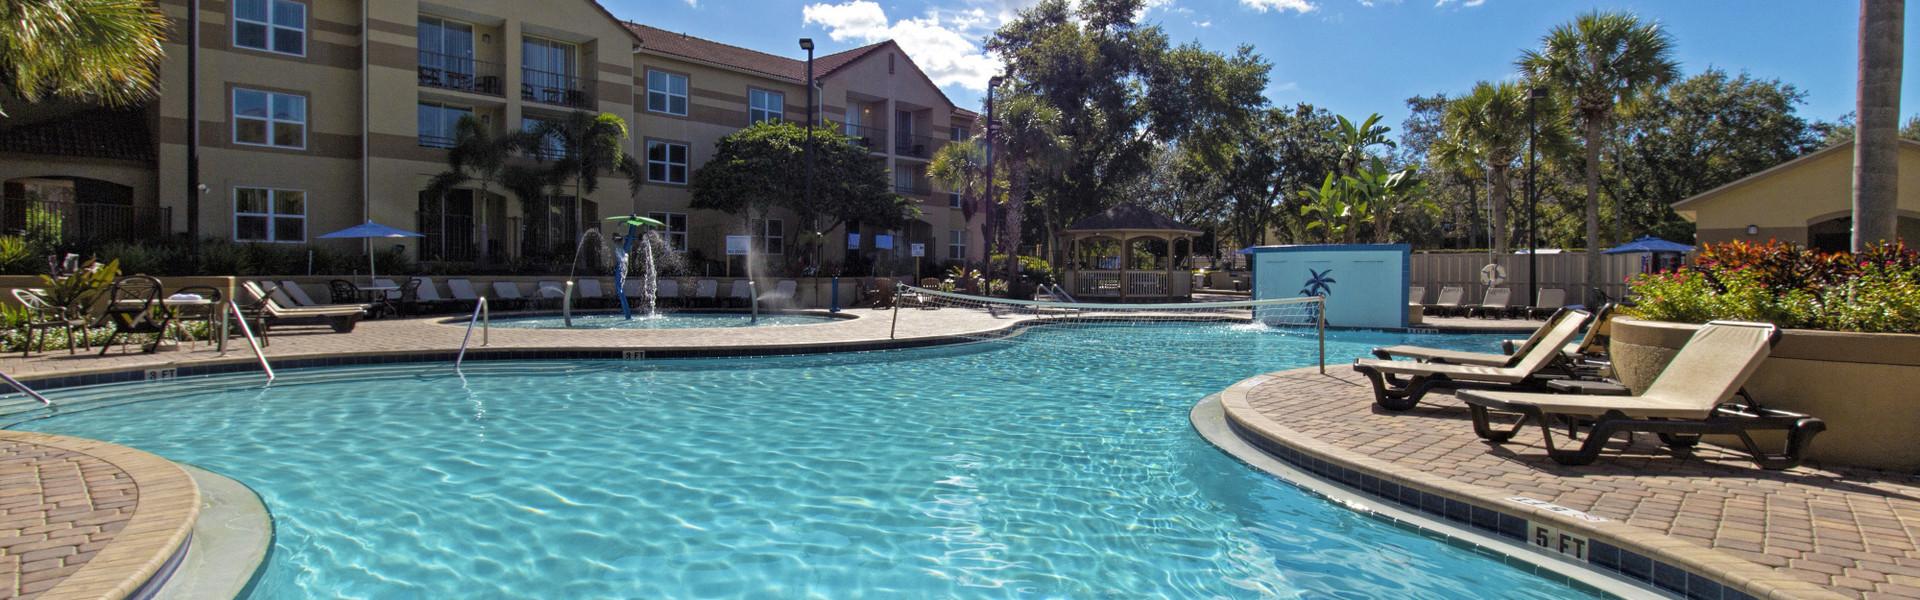 Pics of Lake Buena Vista Florida Resorts | Westgate Blue Tree Resort Lake Buena Vista | Resorts Near Sea World, Orlando, FL 32836